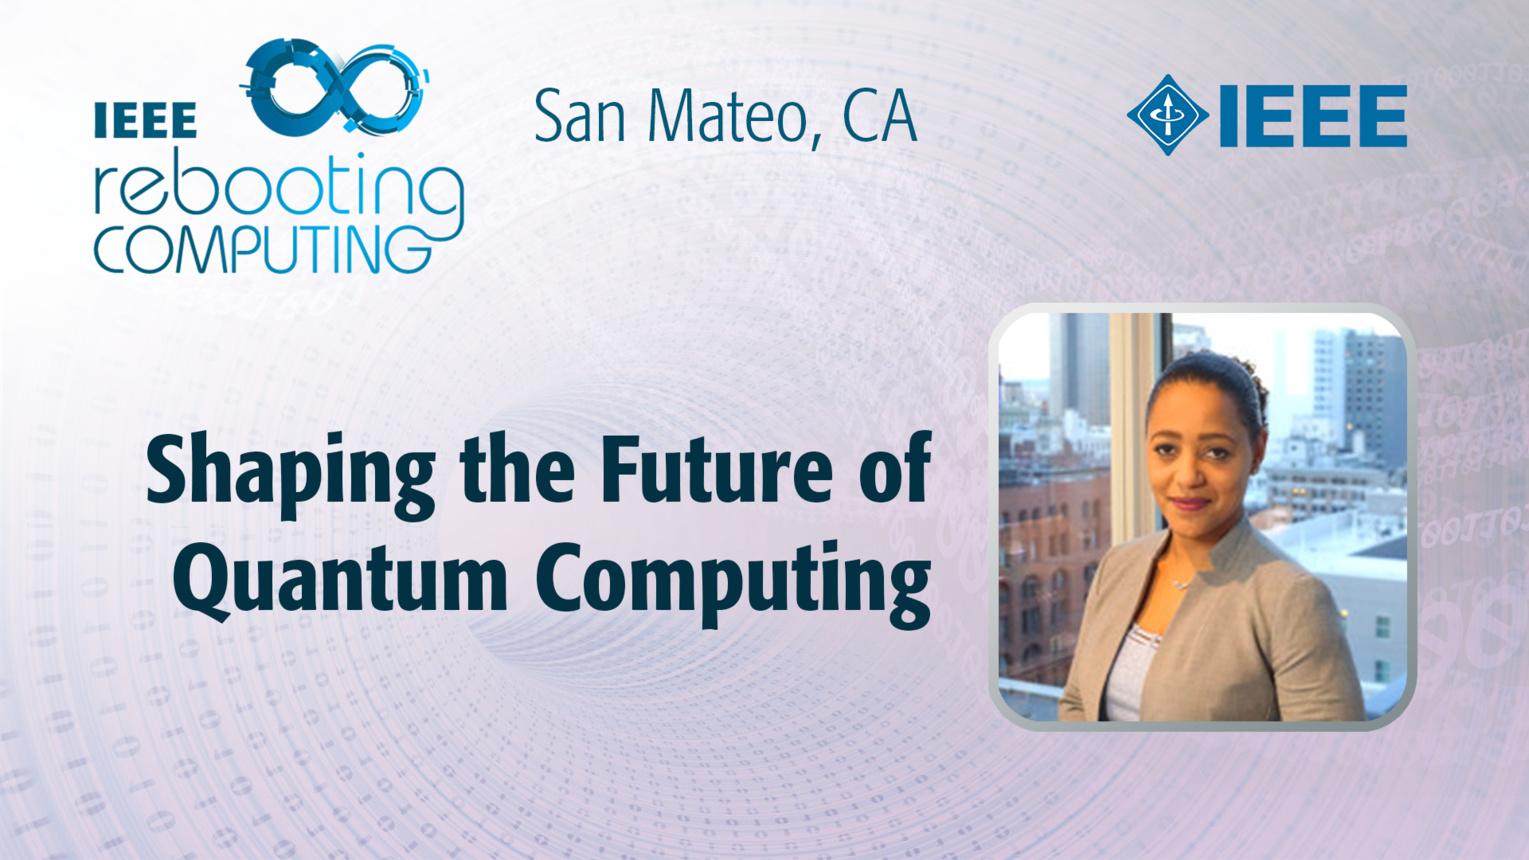 Shaping the Future of Quantum Computing - Suhare Nur - ICRC San Mateo, 2019